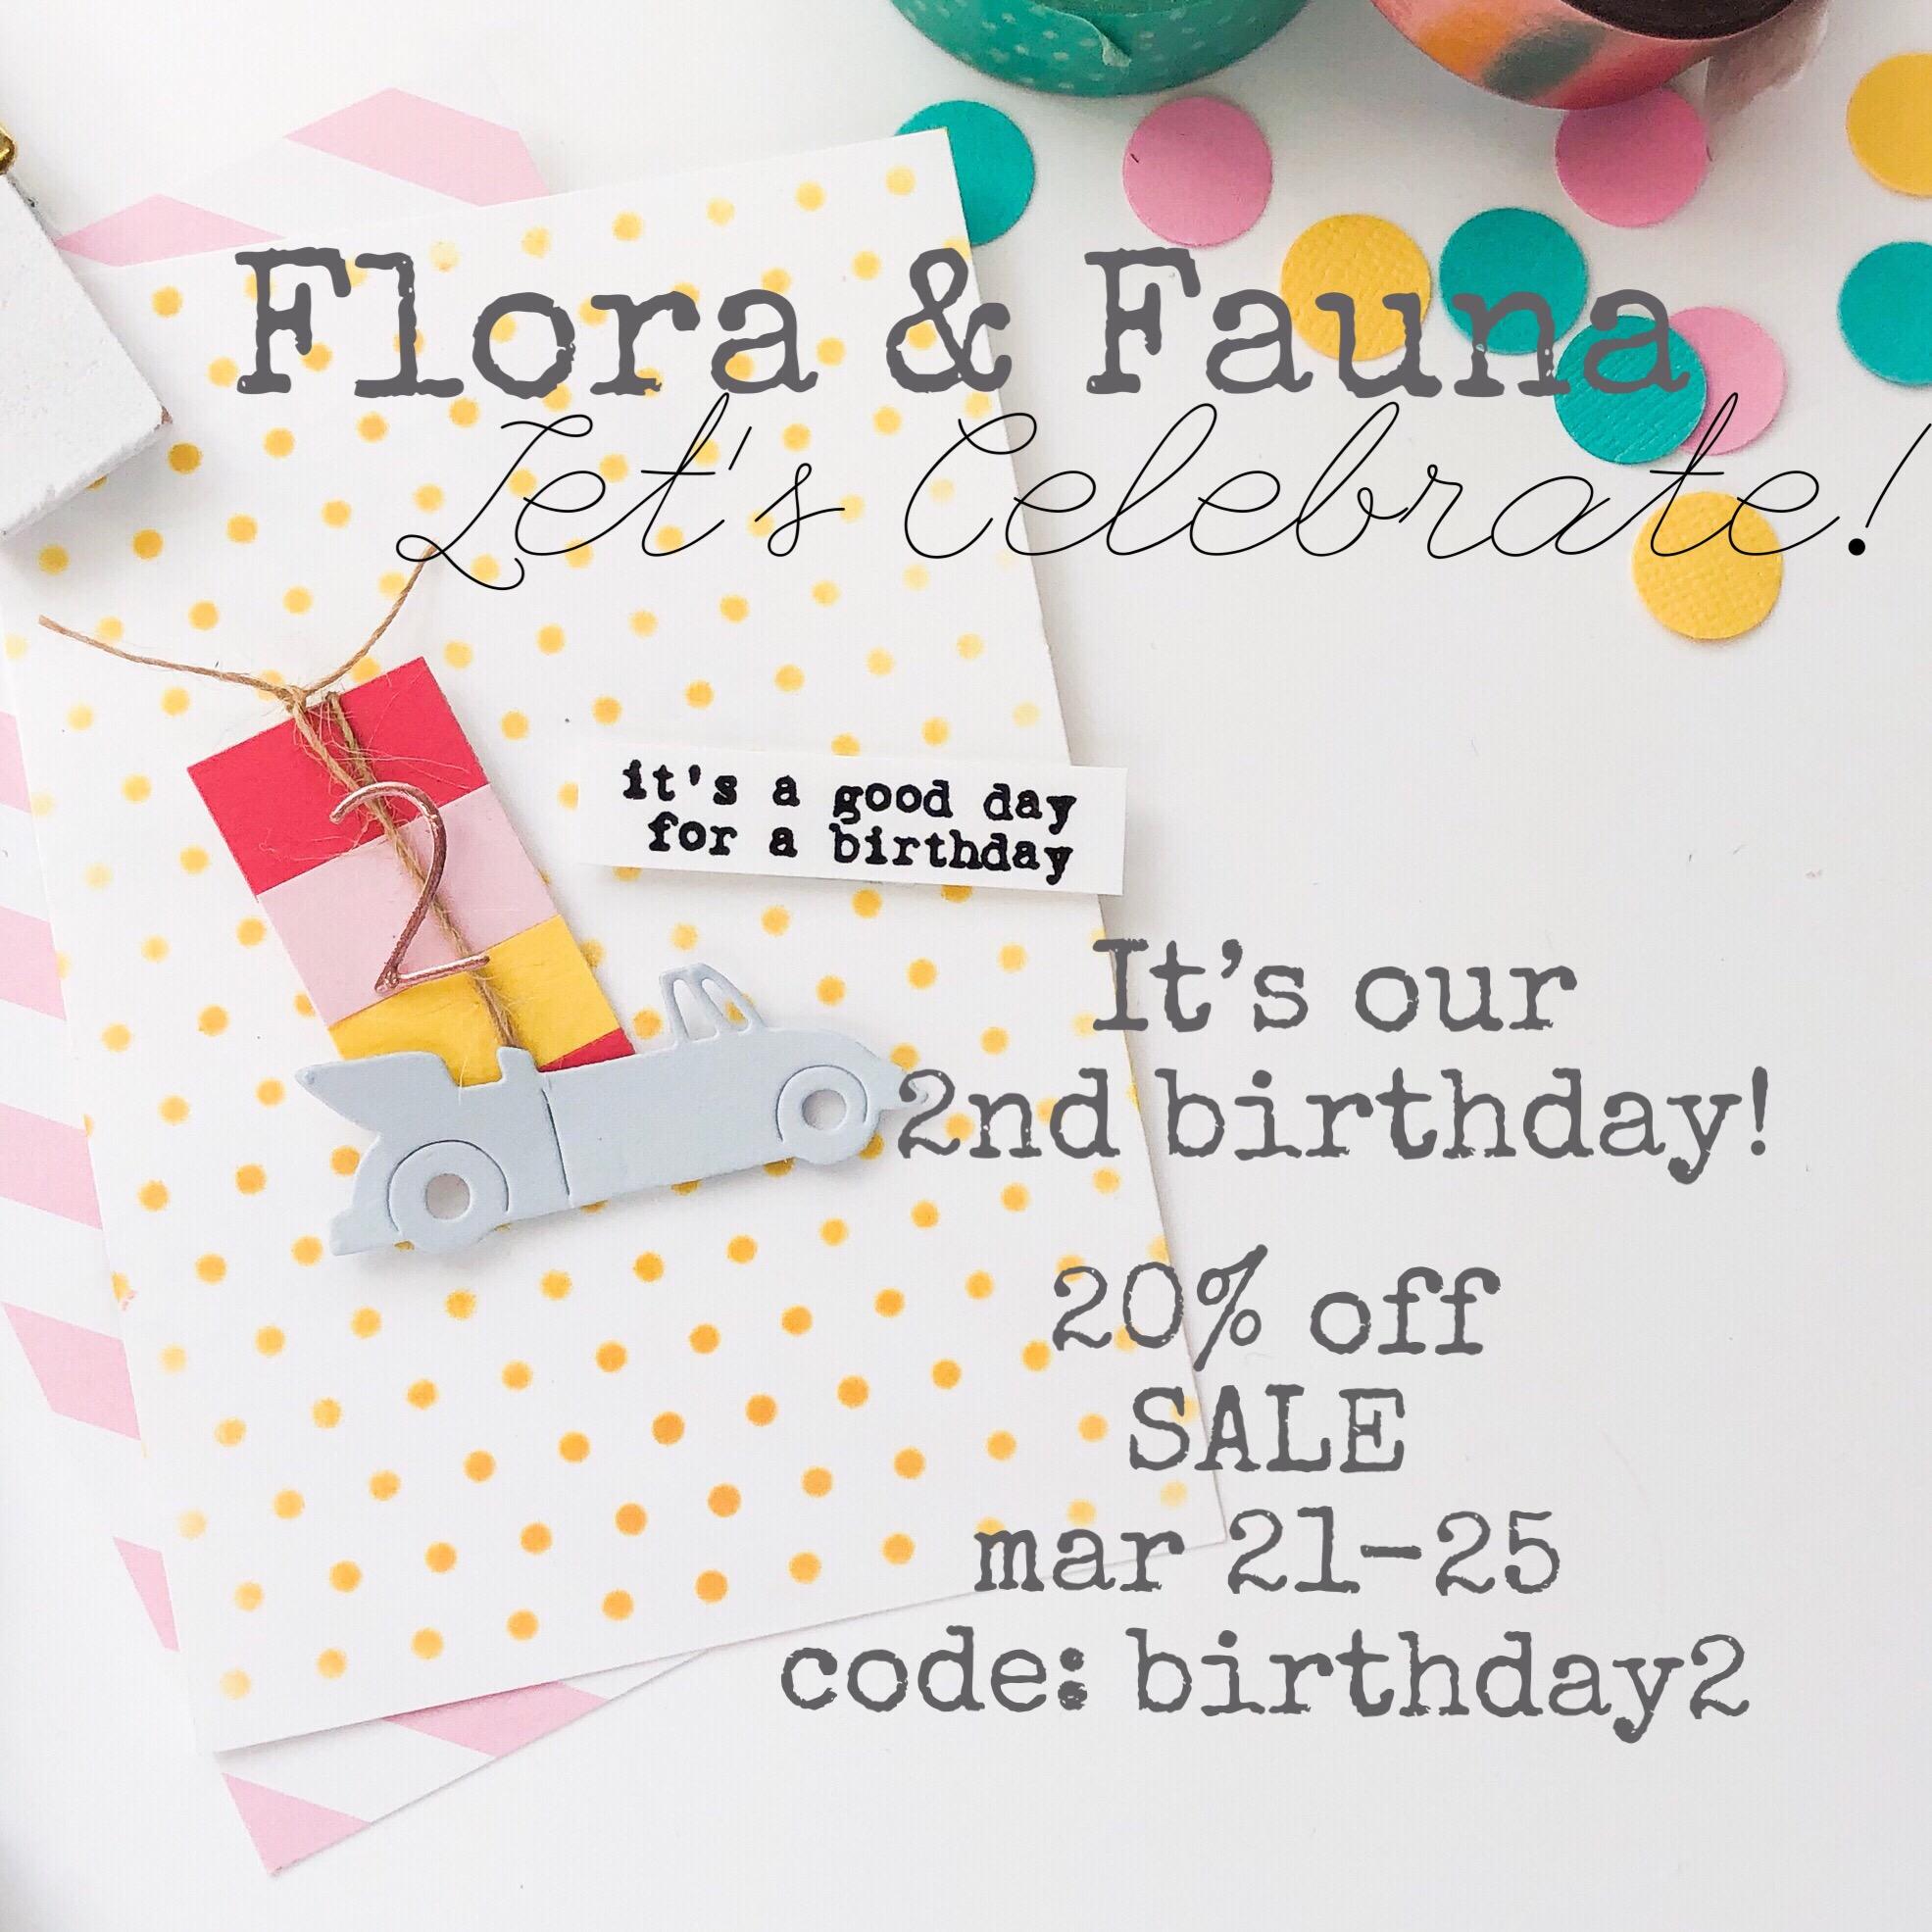 ff_2ndBday_sale.JPG